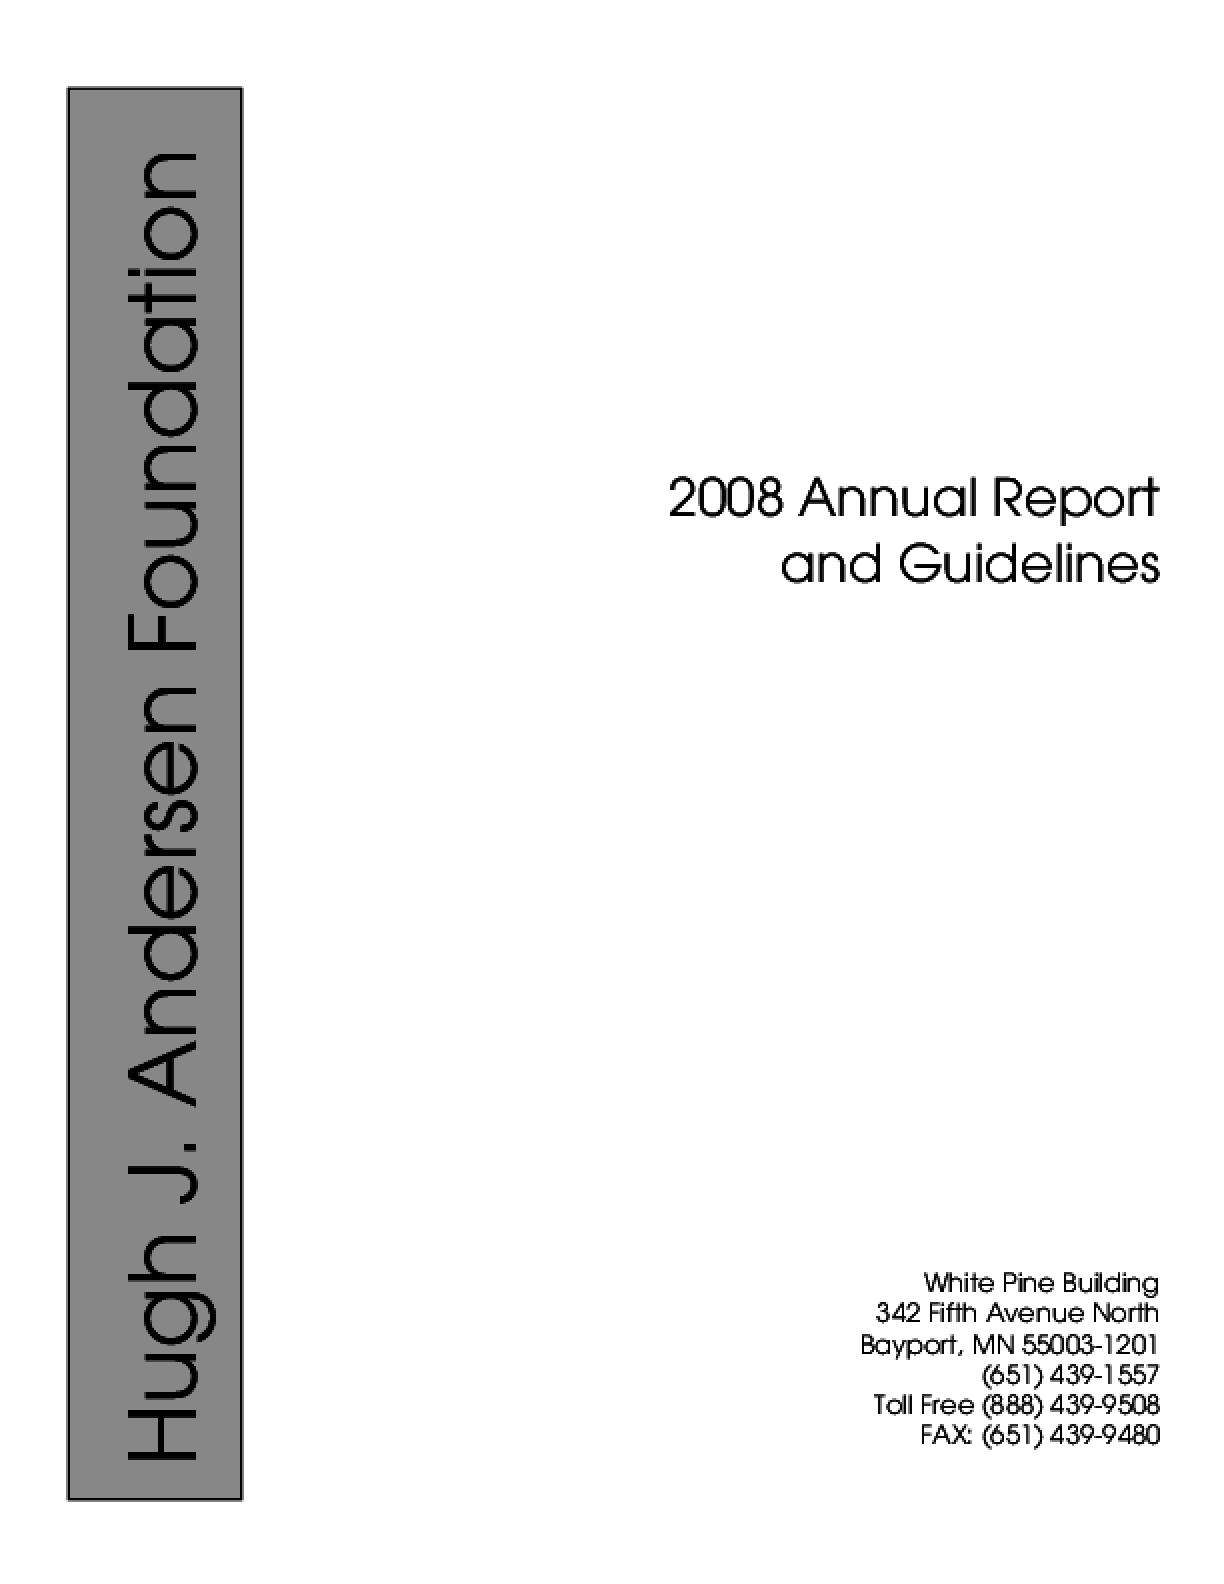 Hugh J. Andersen Foundation - 2008 Annual Report